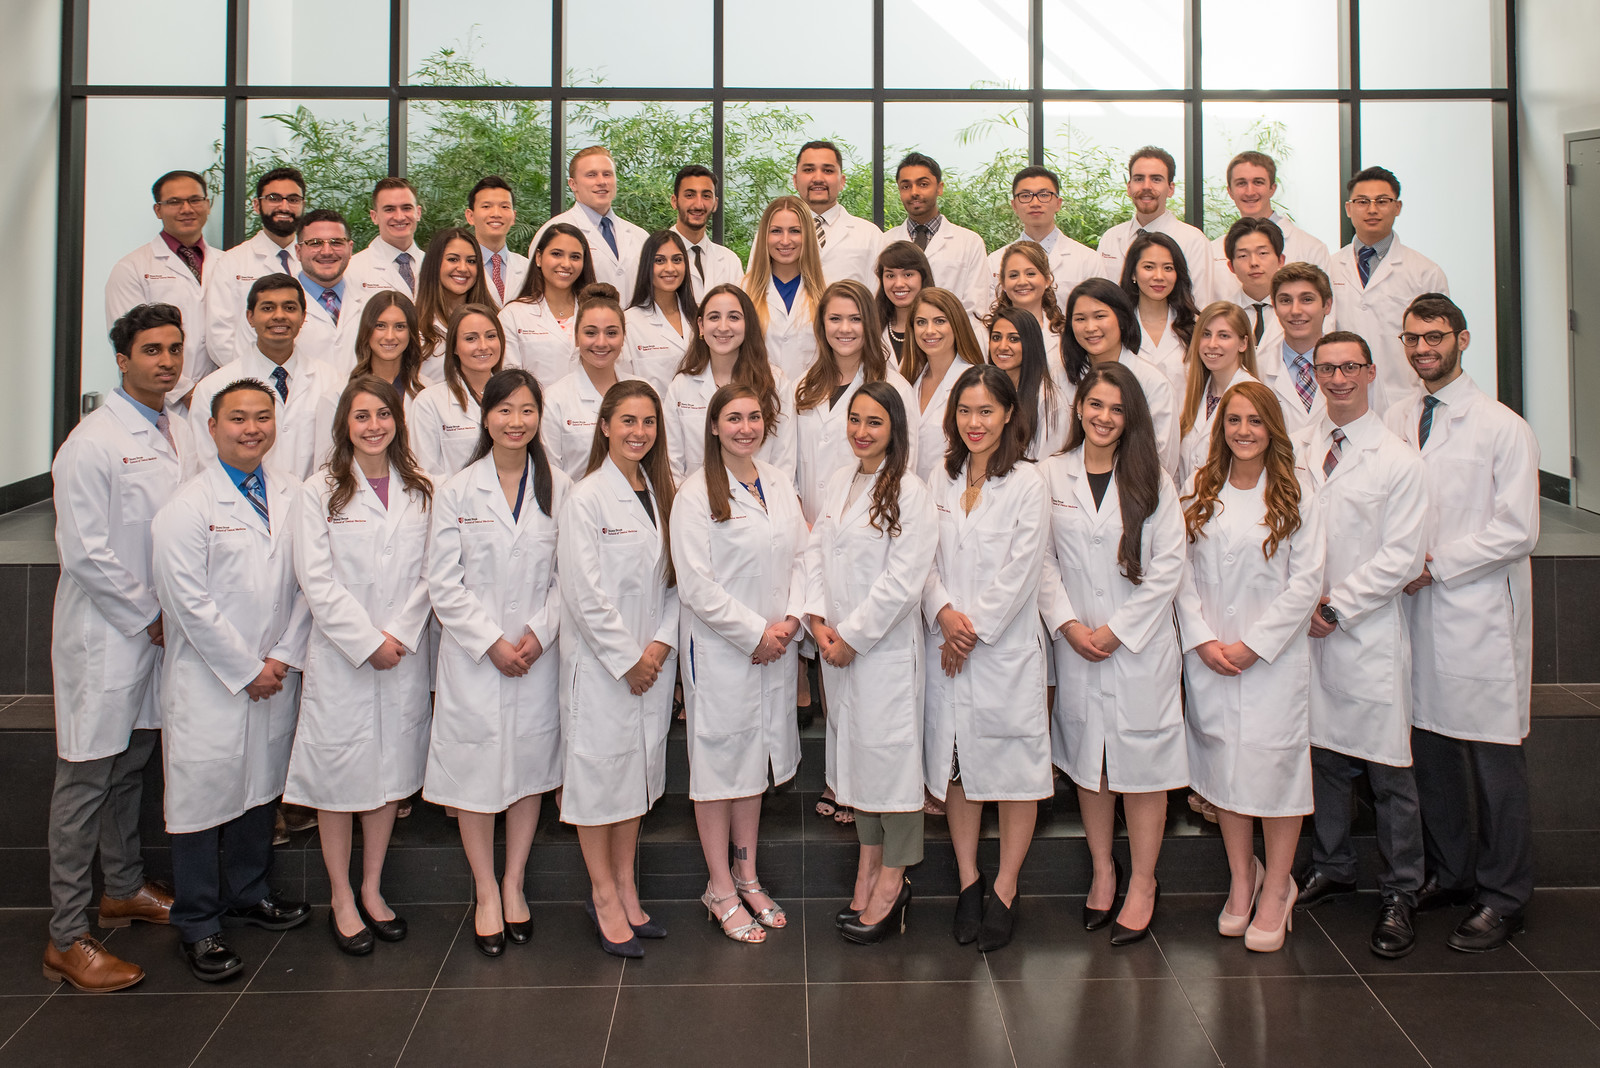 Stony Brook University School of Dental Medicine's Class of 2021 at their White Coat Ceremony